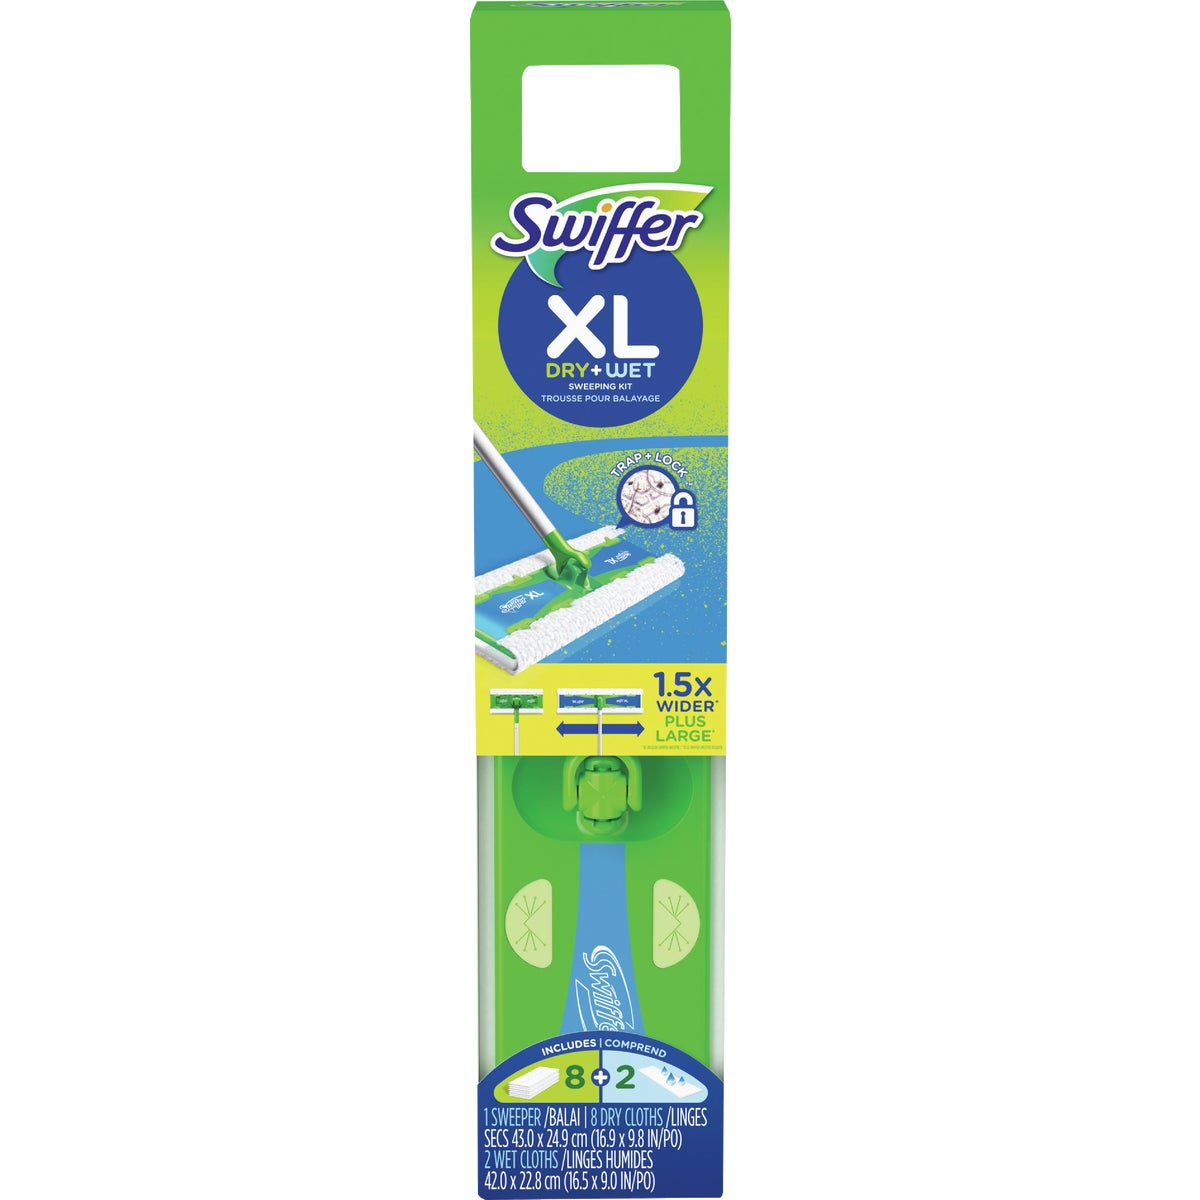 SWIFFER XL STARTER KIT - 87007 by Procter & Gamble